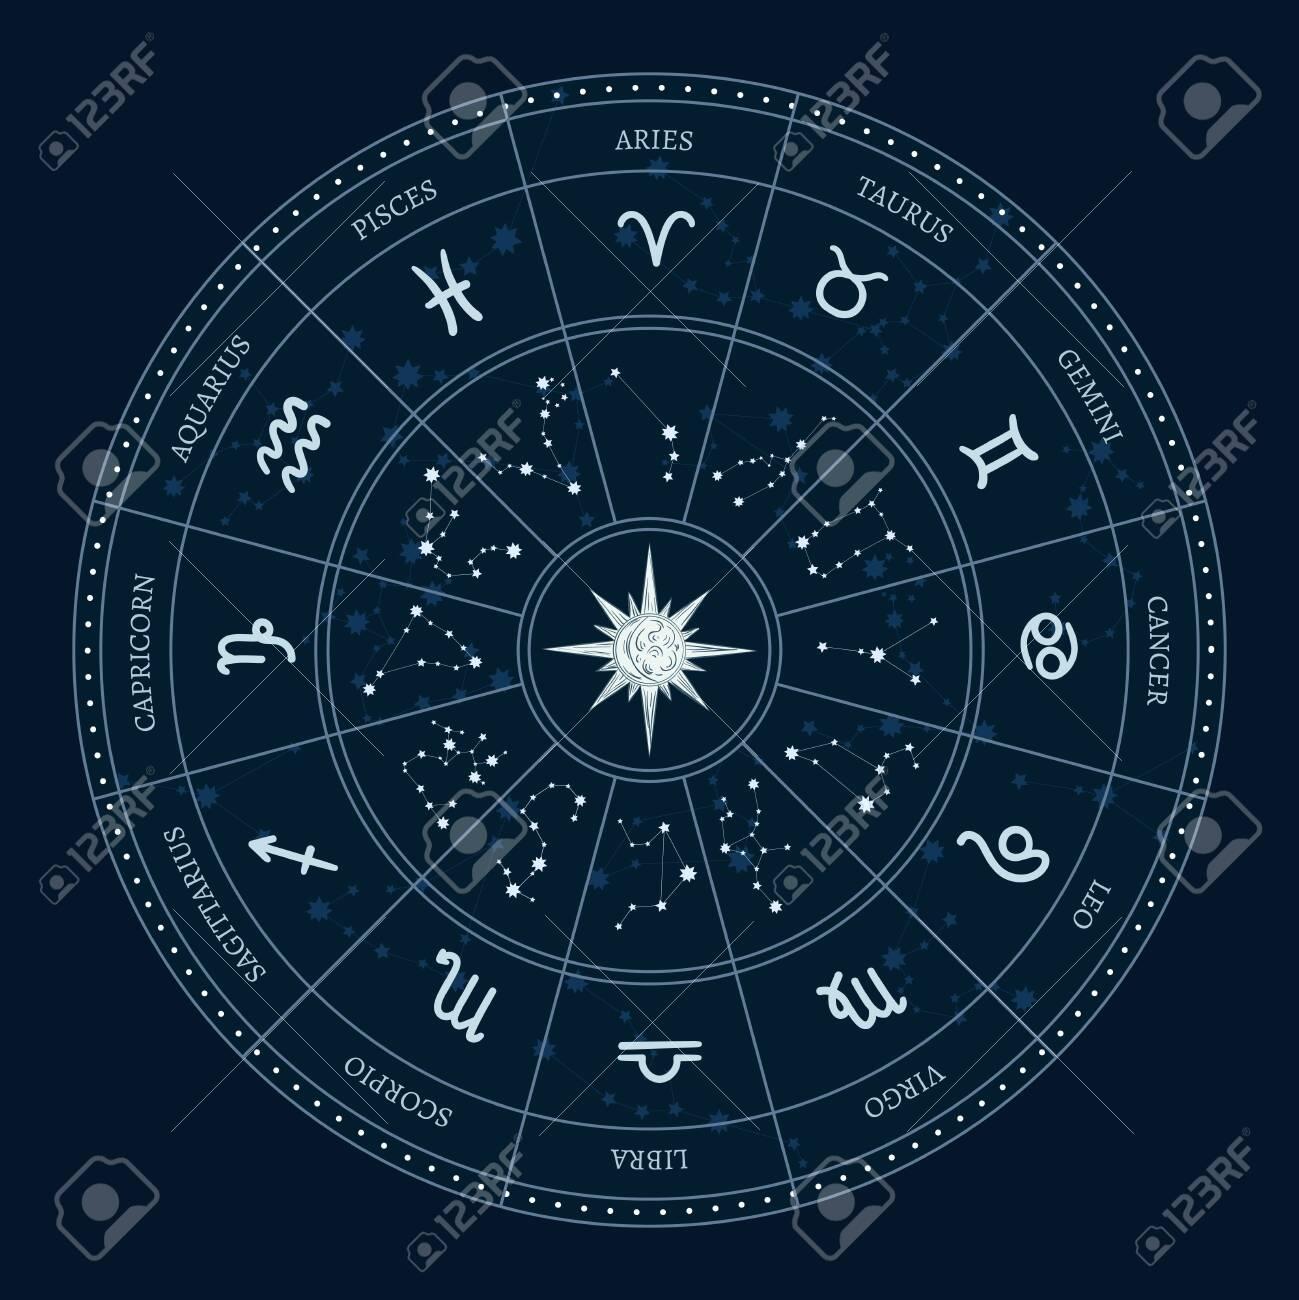 Astrology Zodiac Signs Circle Horoscope Wheel With Zodiac Symbols Royalty Free Cliparts Vectors And Stock Illustration Image 136076341